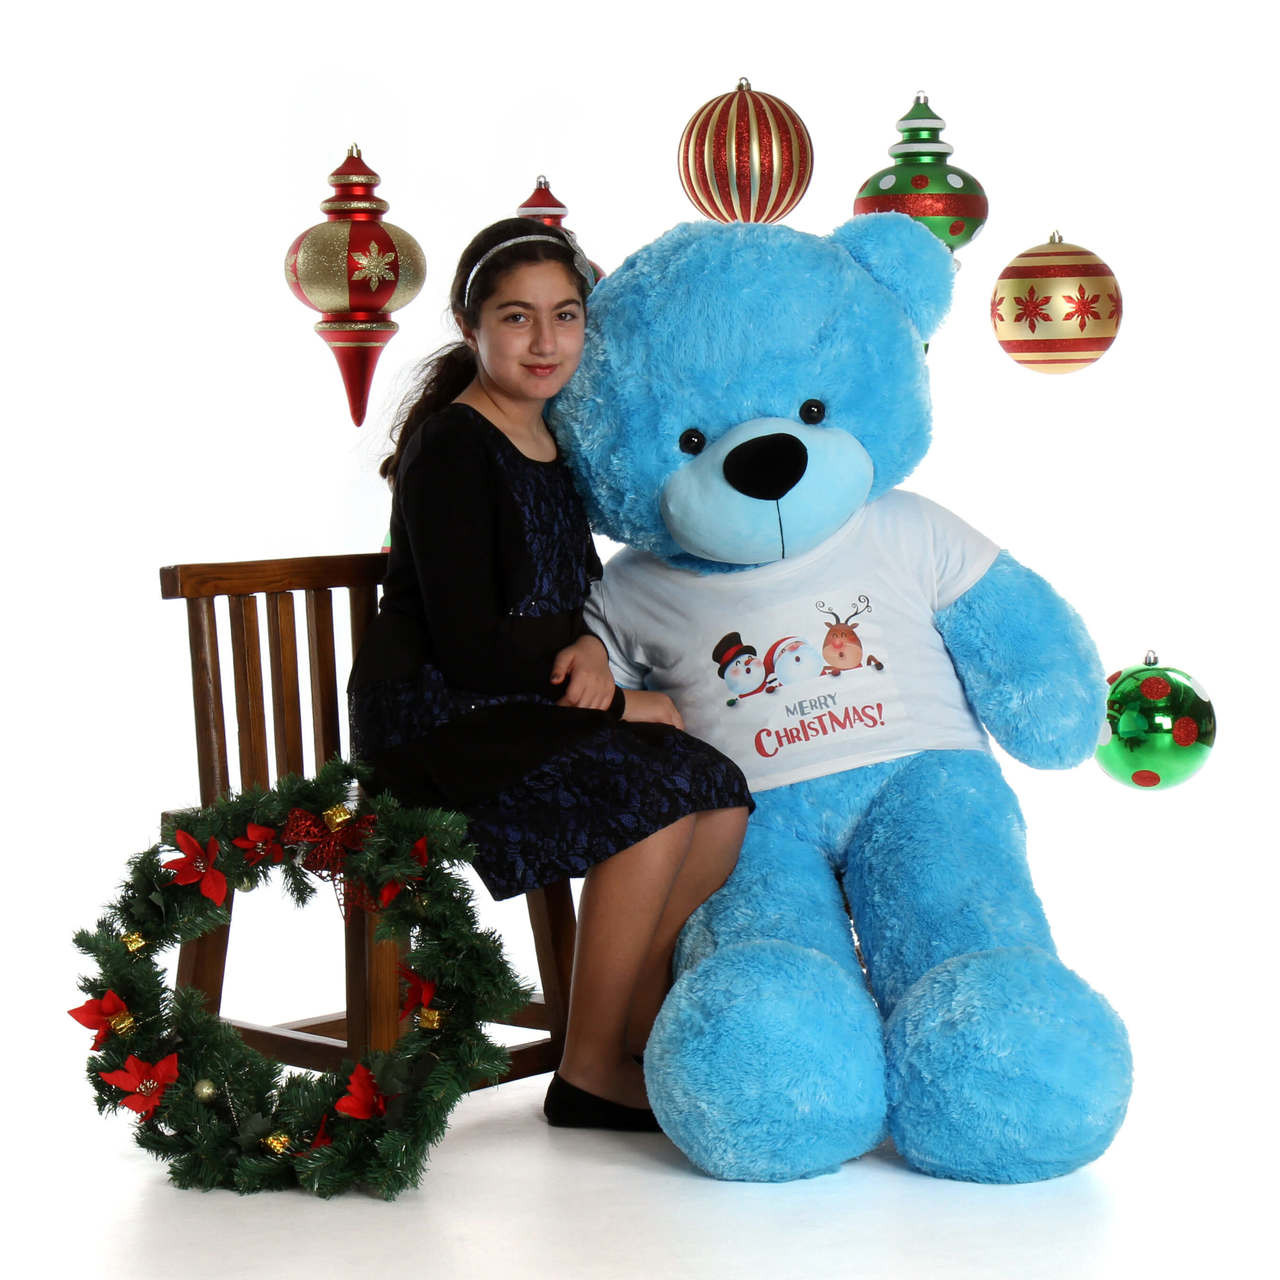 5ft Happy Cuddles Giant Blue Teddy Bear in Merry Christmas Shirt